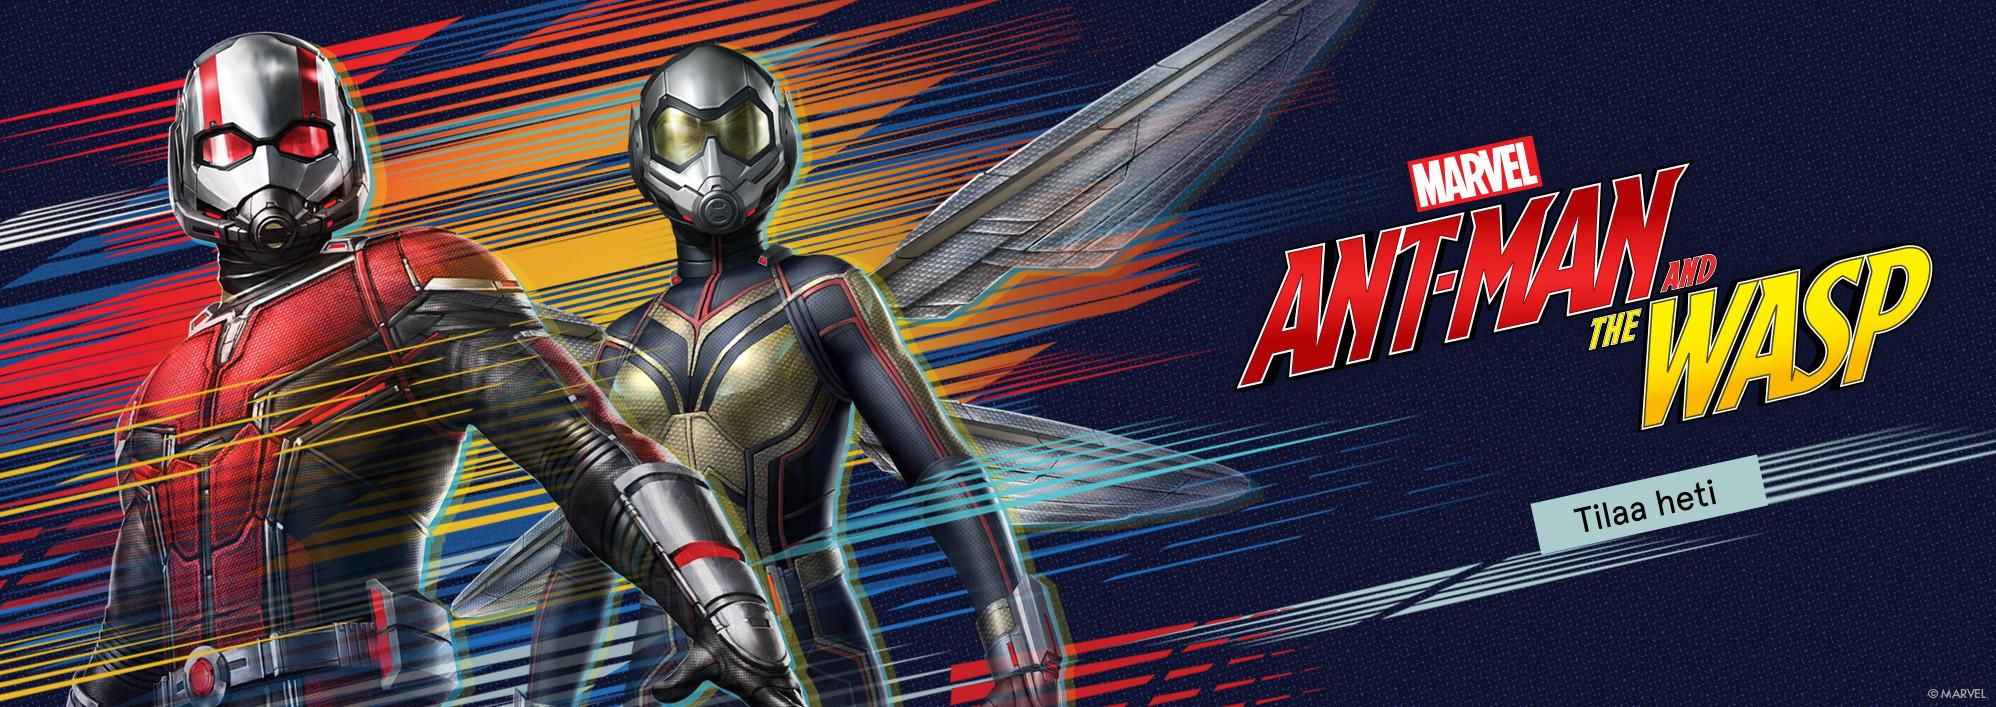 Marvel. Ant-Man and the Wasp. Tilaa heti.